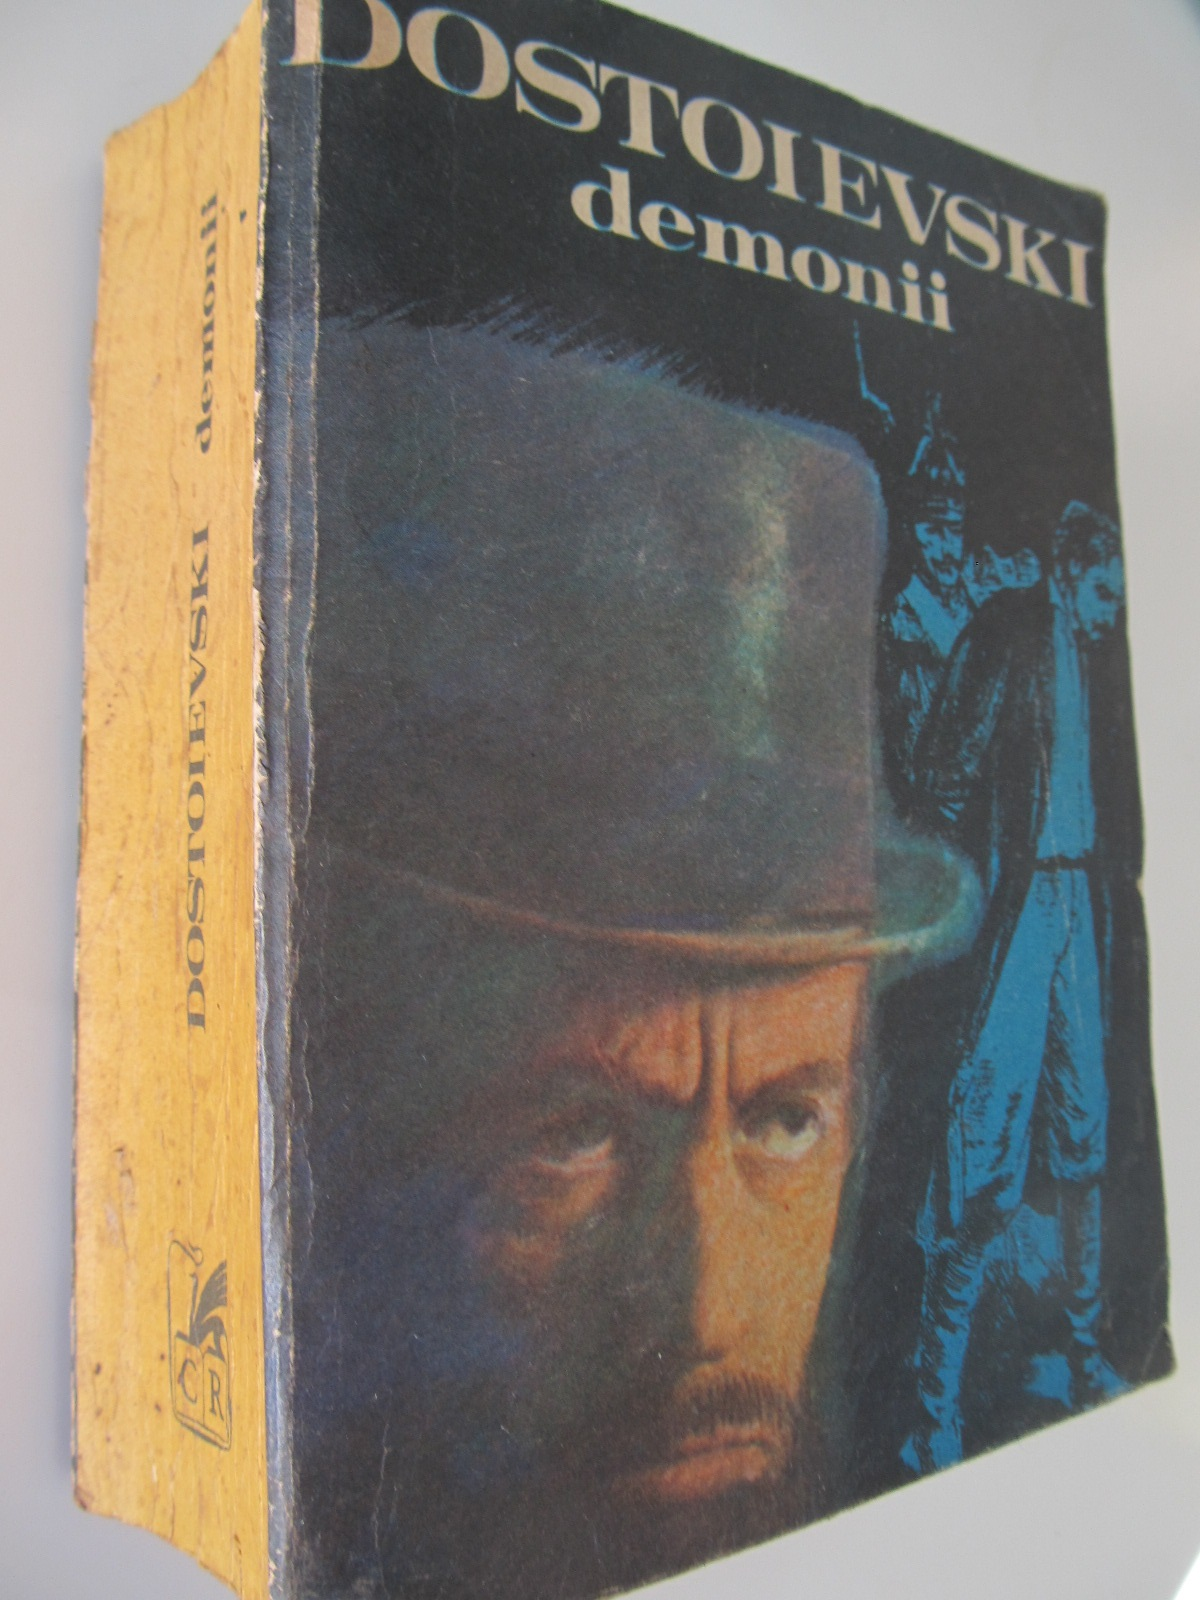 Demonii - Dostoievski | Detalii carte